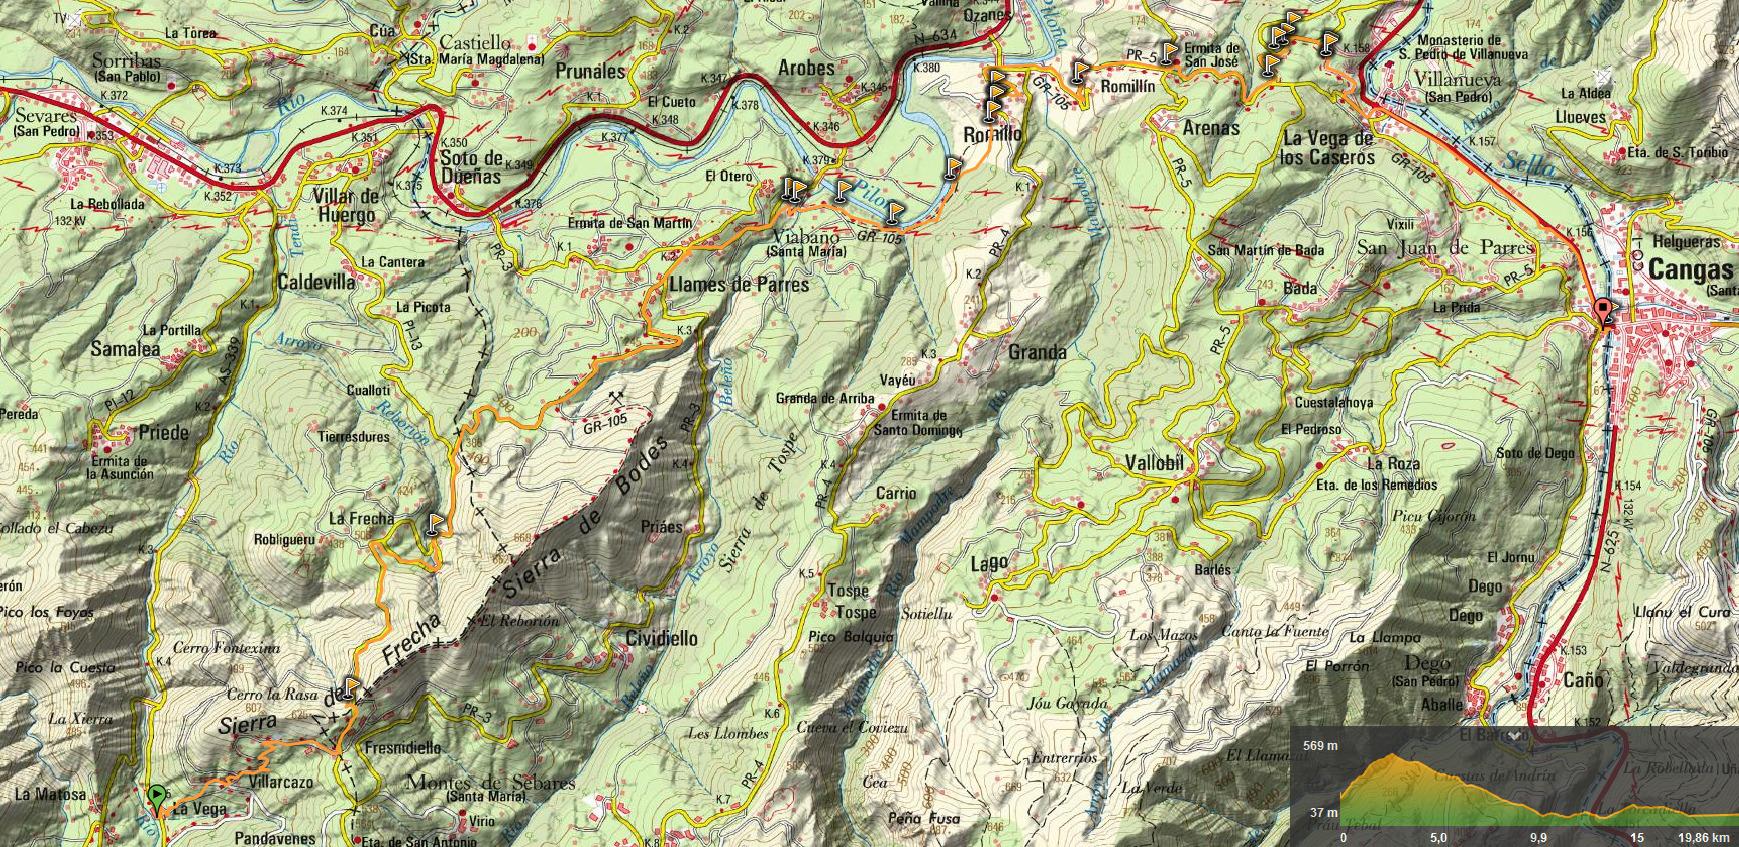 25 mayo, 2019: Oviedo - Covadonga 6ª etapa (La Matosa - Cangas de Onís) (Wikiloc / IGN)